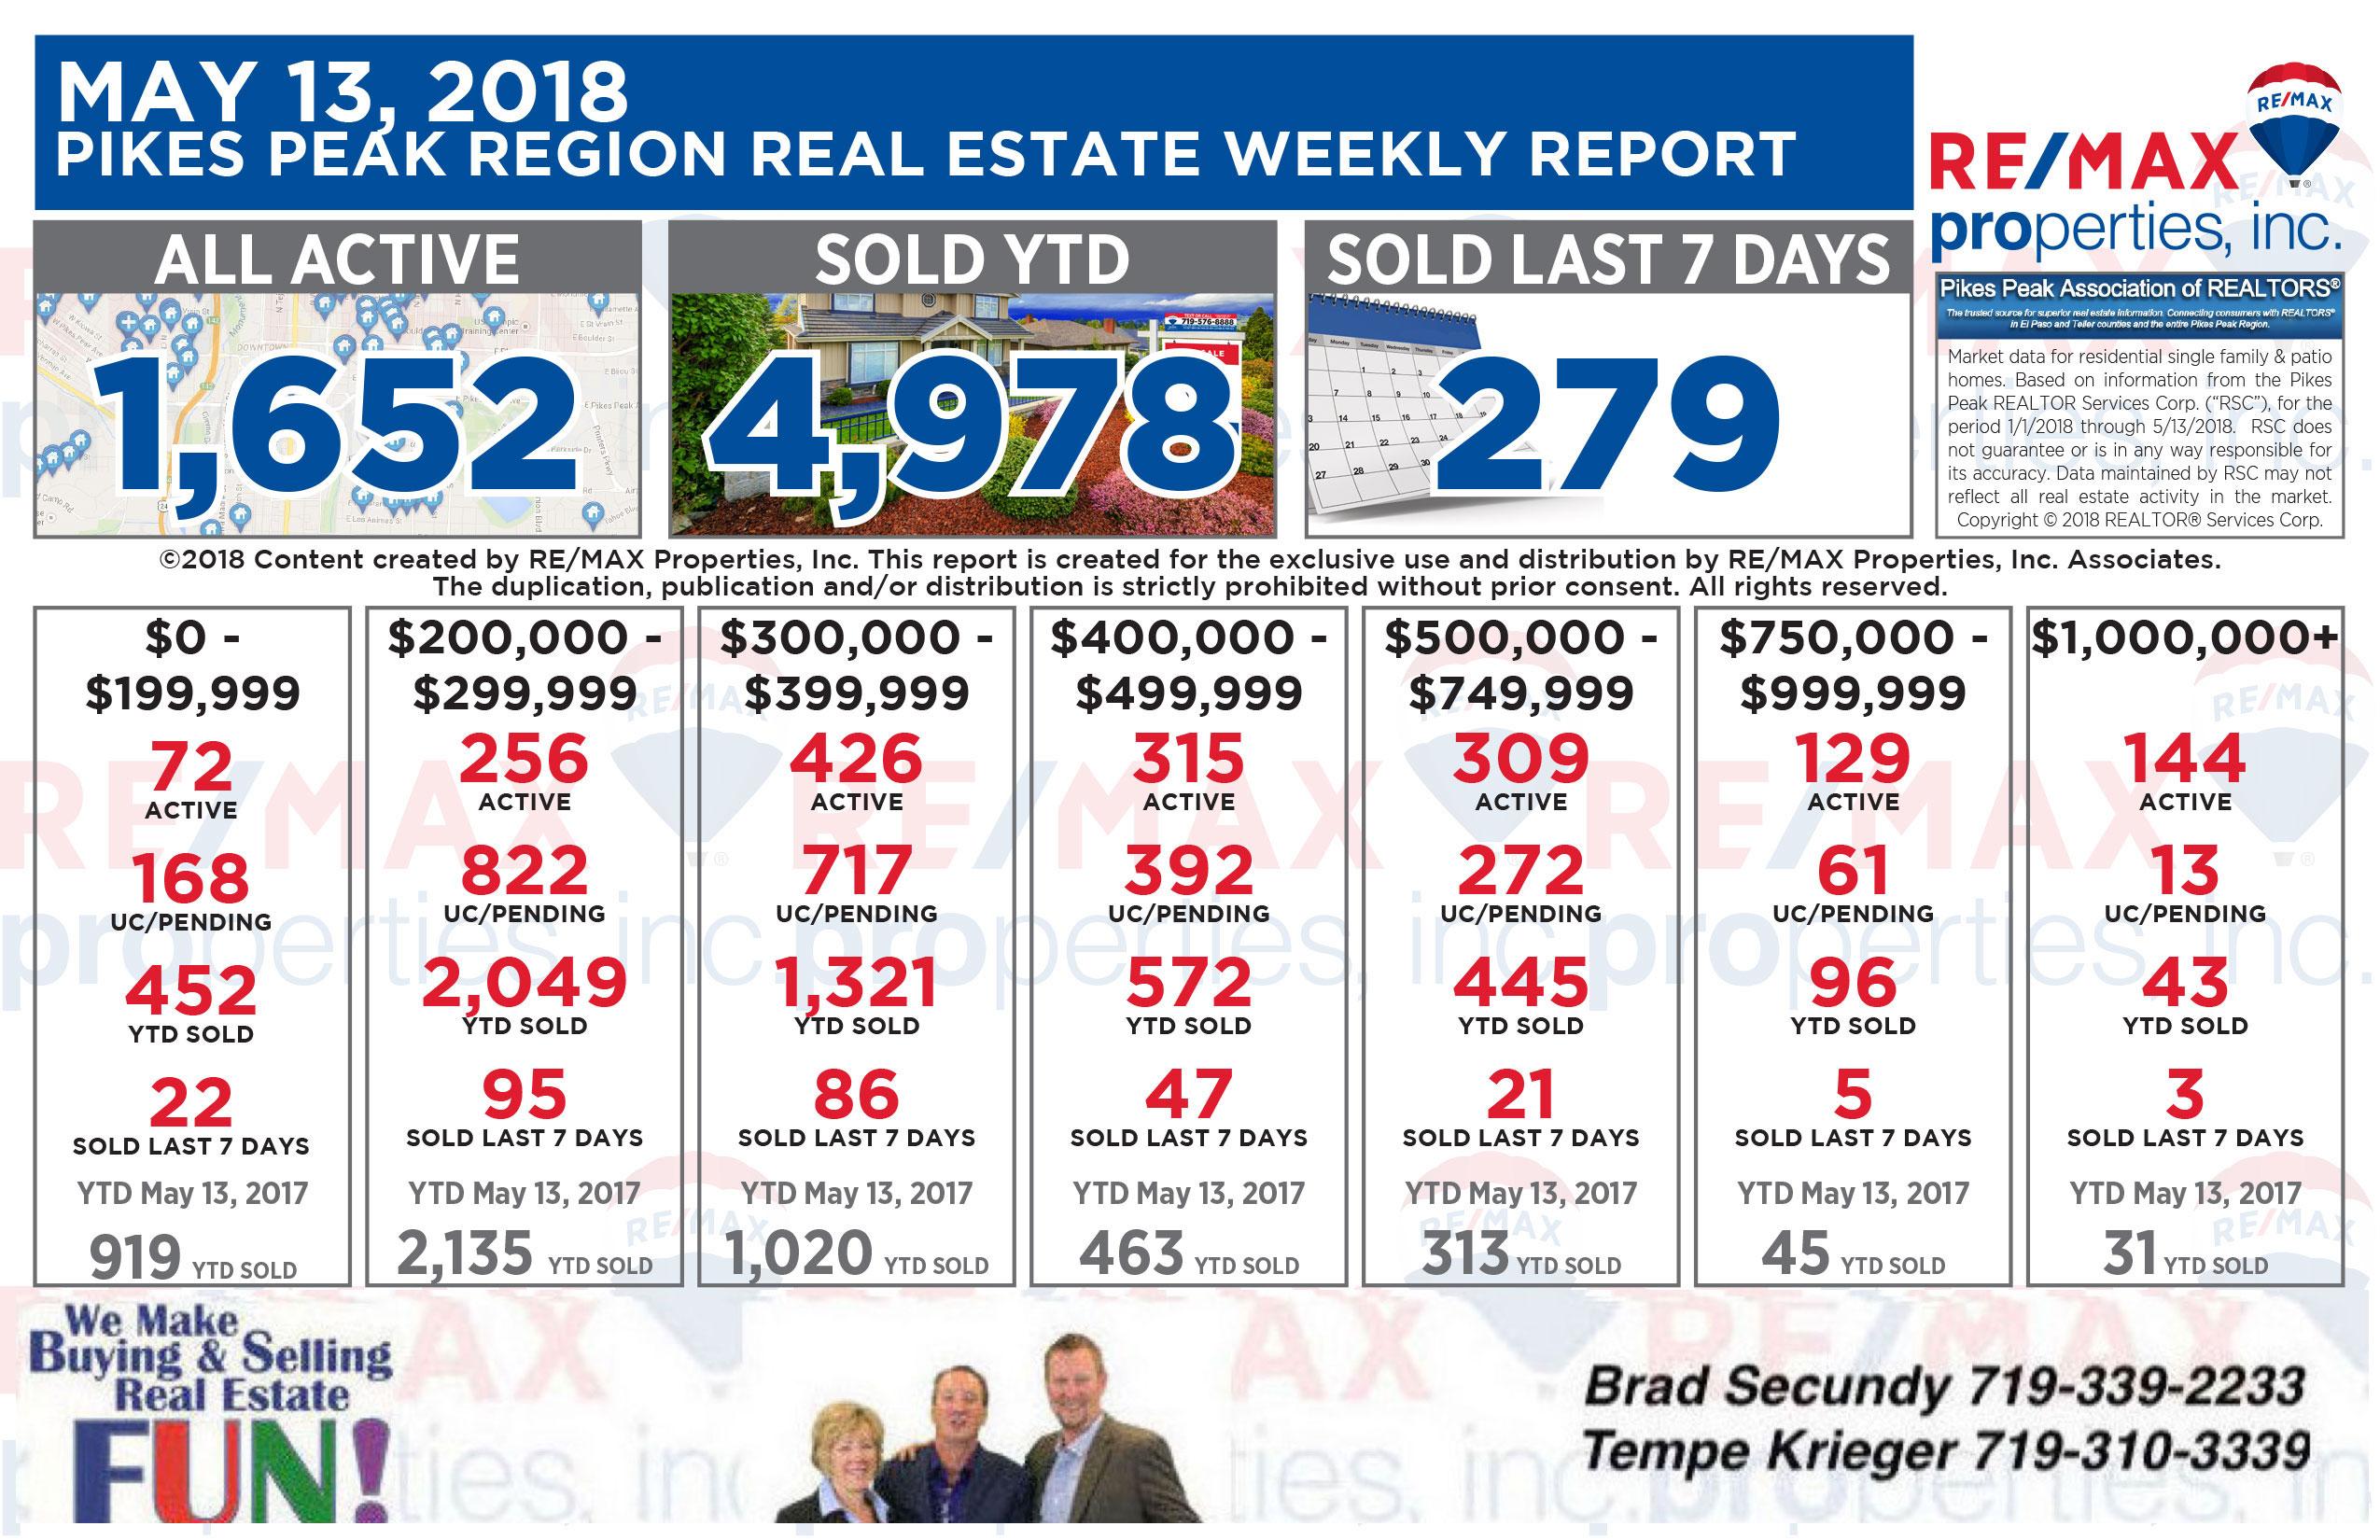 Colorado Springs Real Estate Statistics 5-13-2018